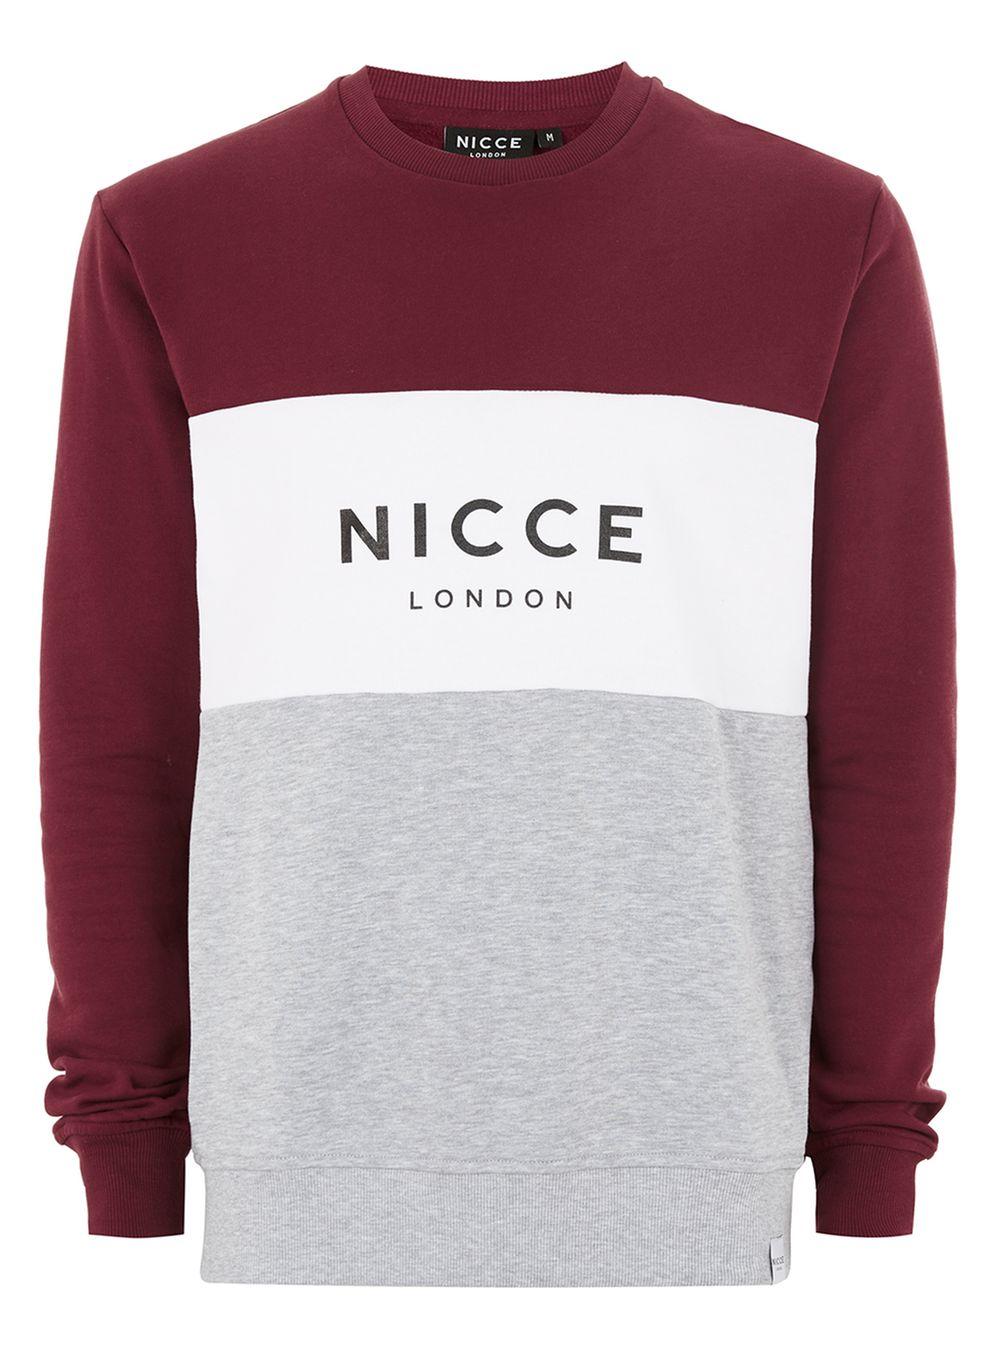 NICCE mens Sweat shirt £7 was £45 (free C+C) @ Topman